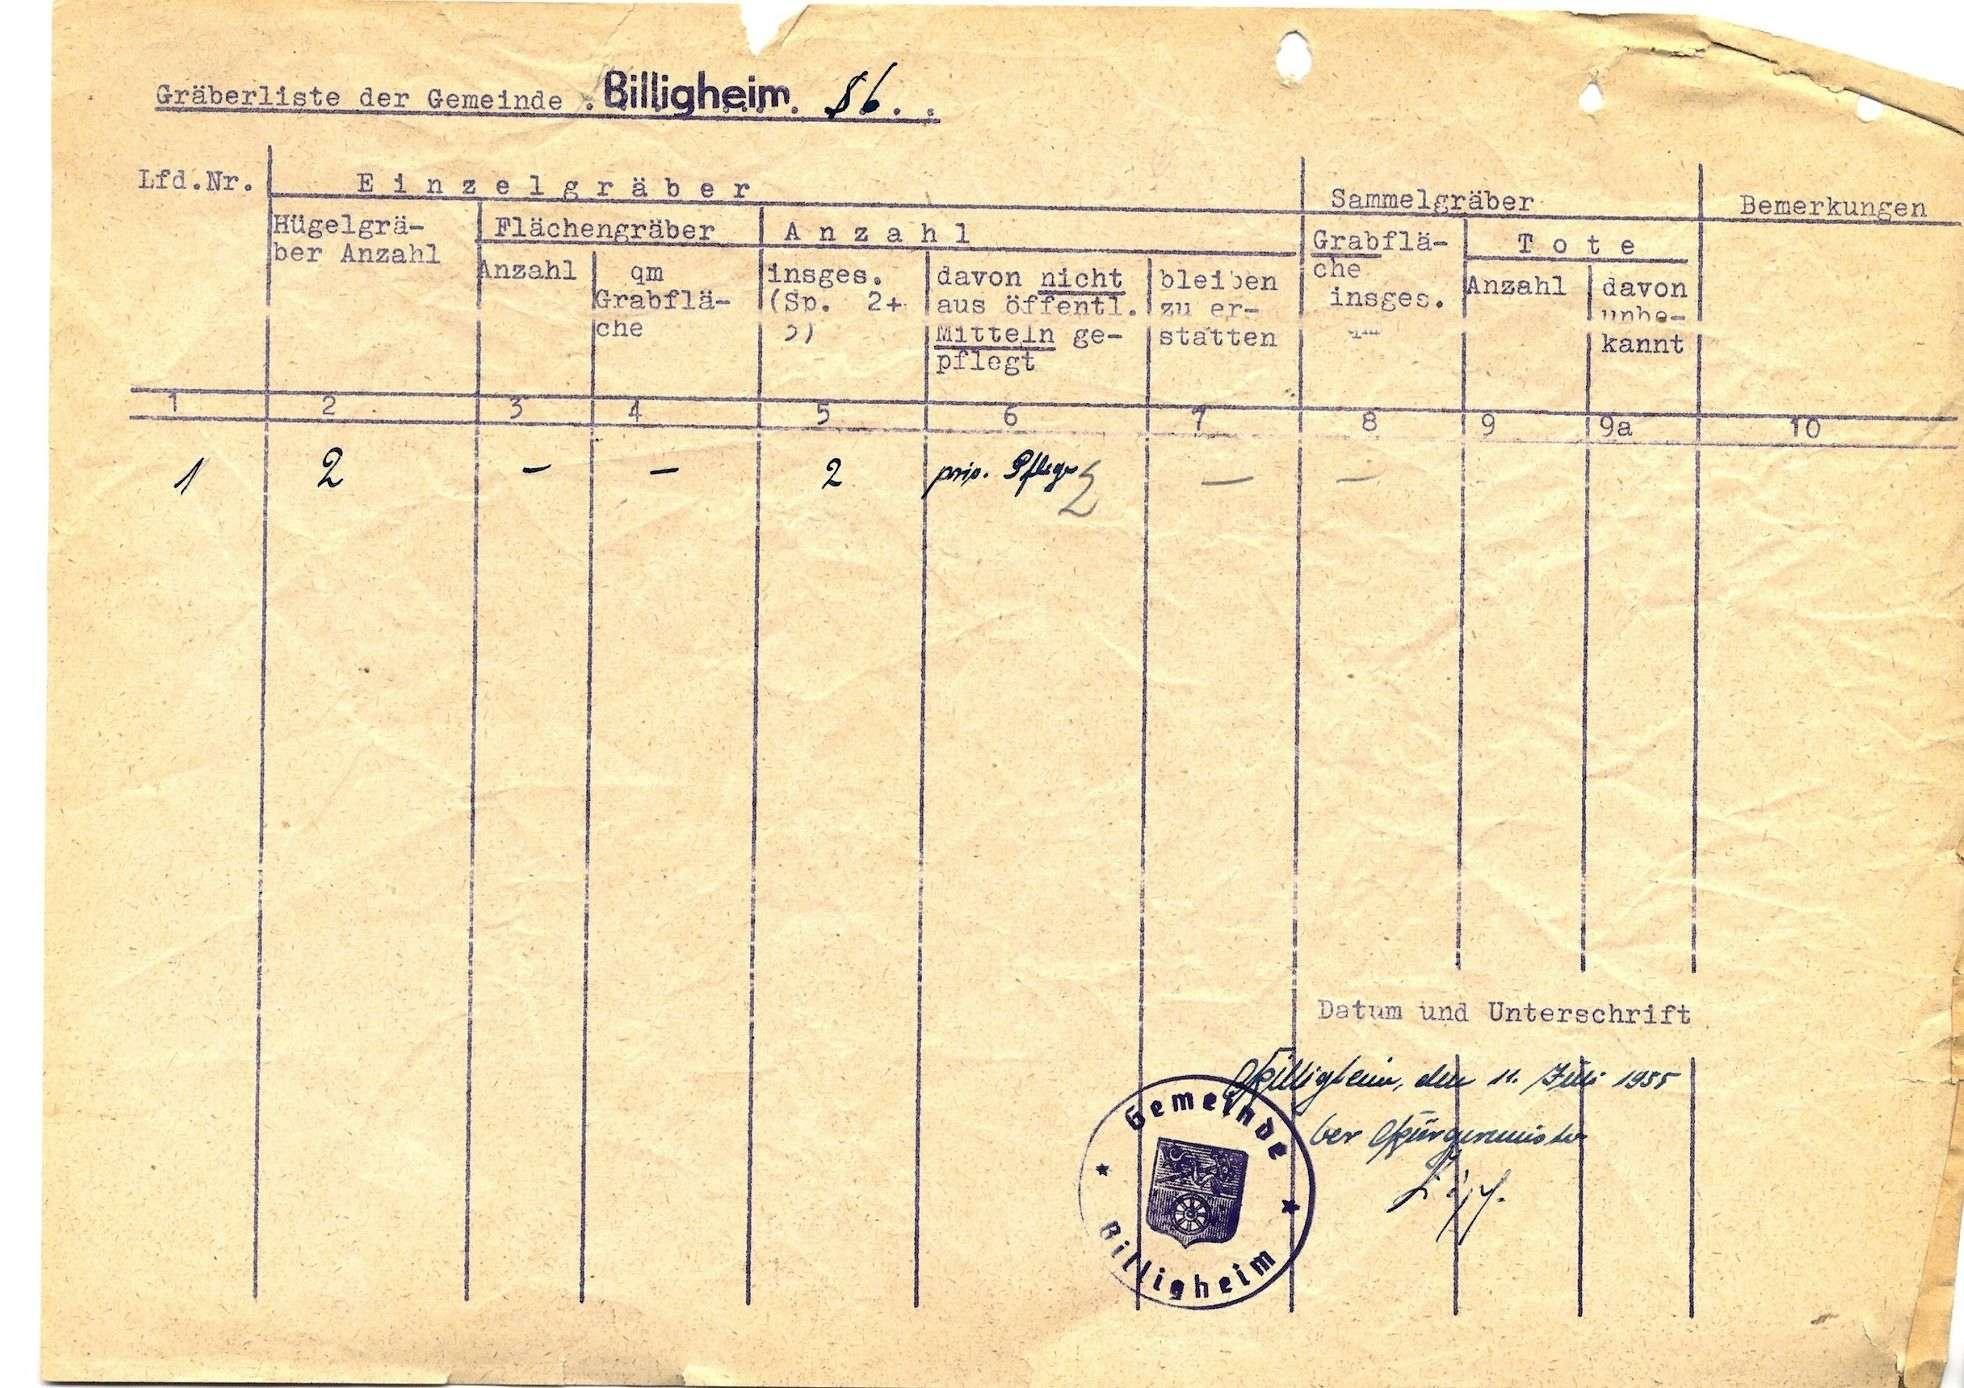 Billigheim, Bild 3